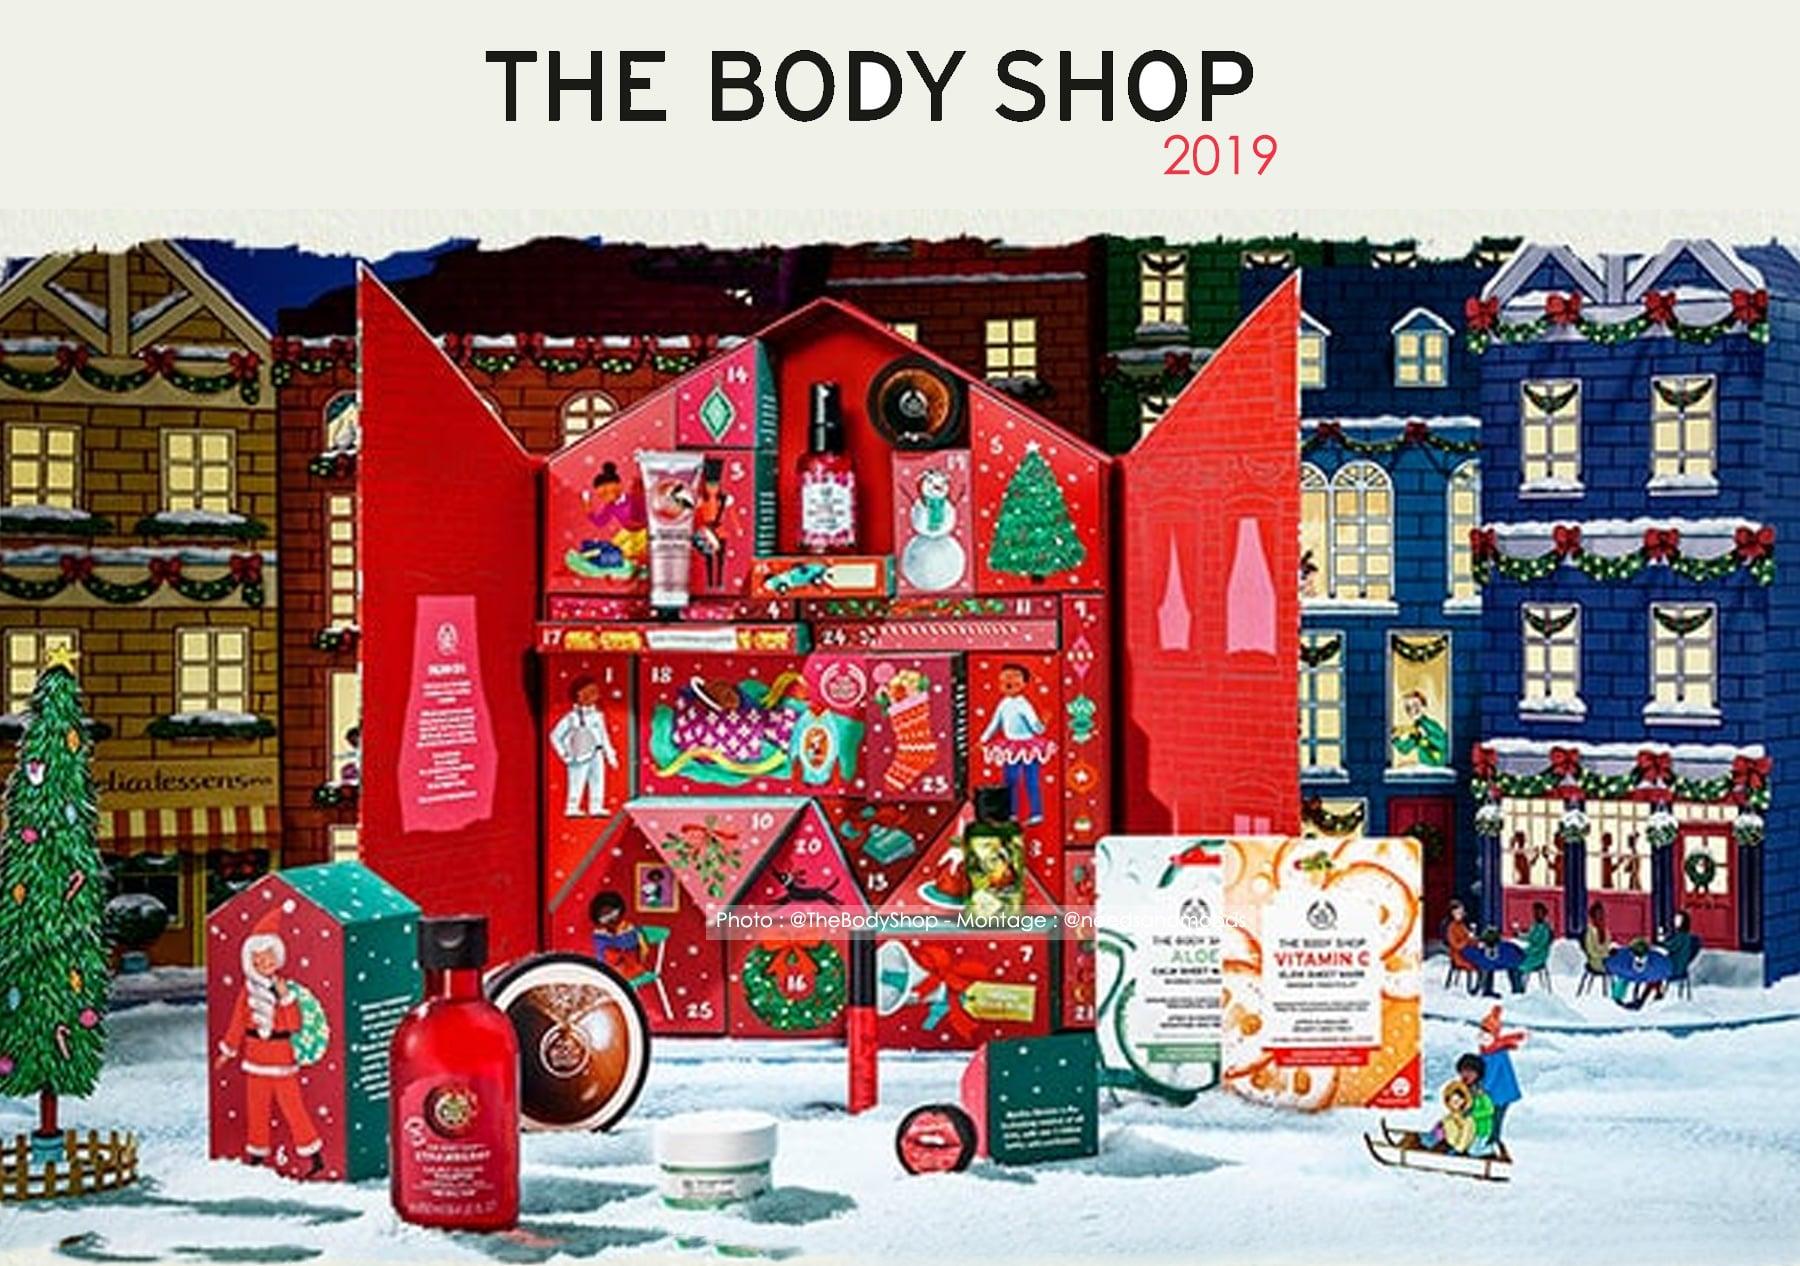 calendrier-de-l'avent-the-body-shop-2019-classique